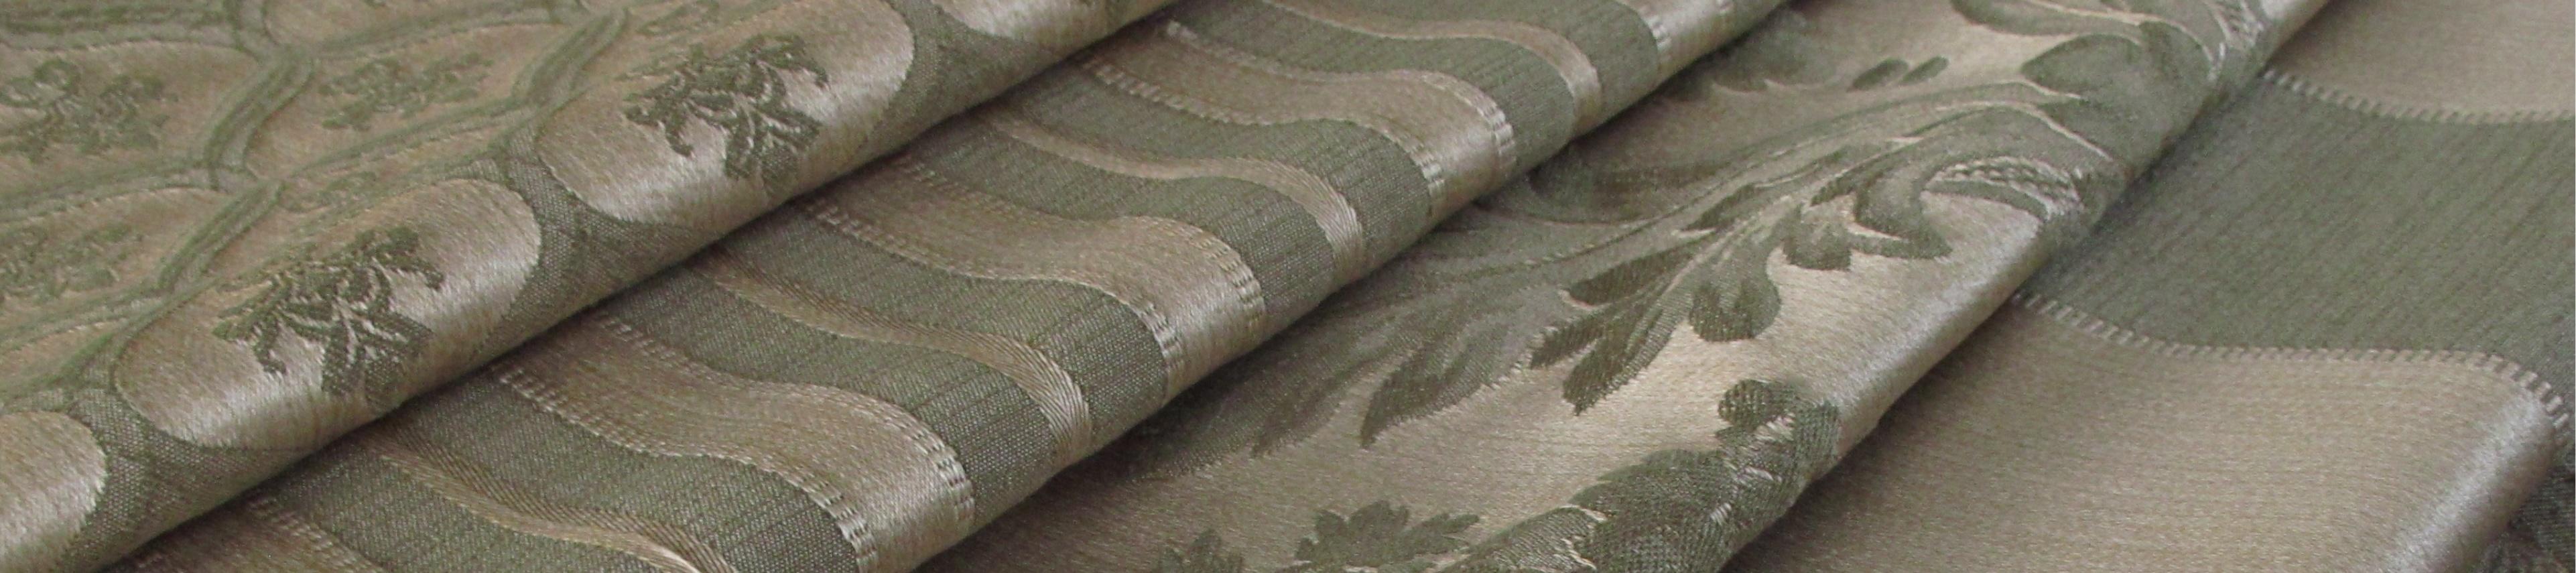 Upholstery Fabric Birmingham